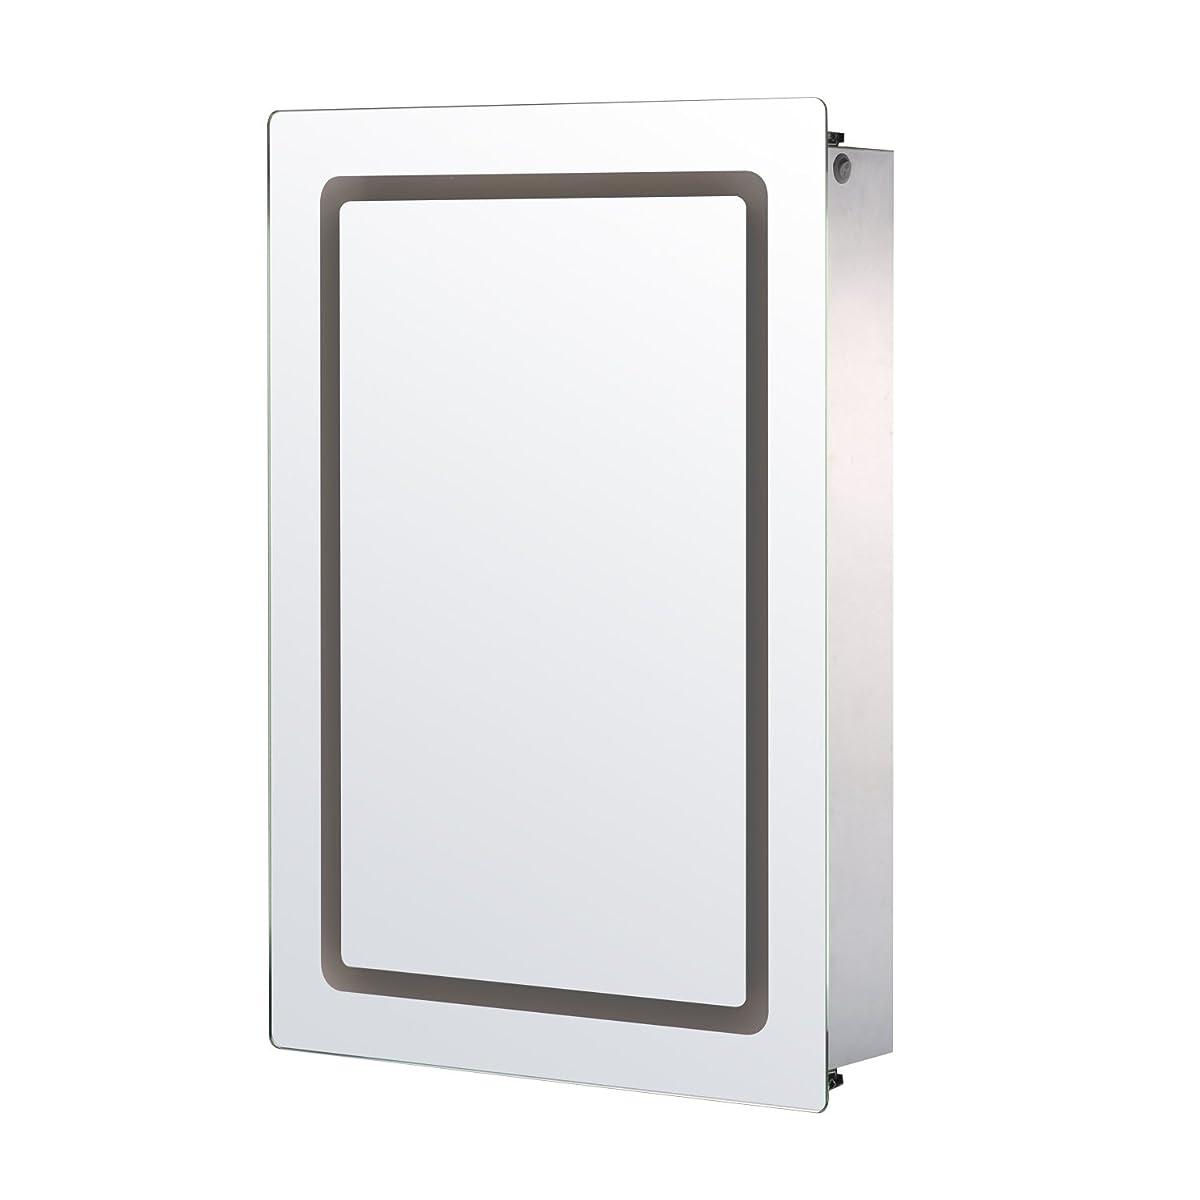 "HomCom 30"" x 21"" LED Sliding Bathroom Mirror / Medicine Wall Cabinet"